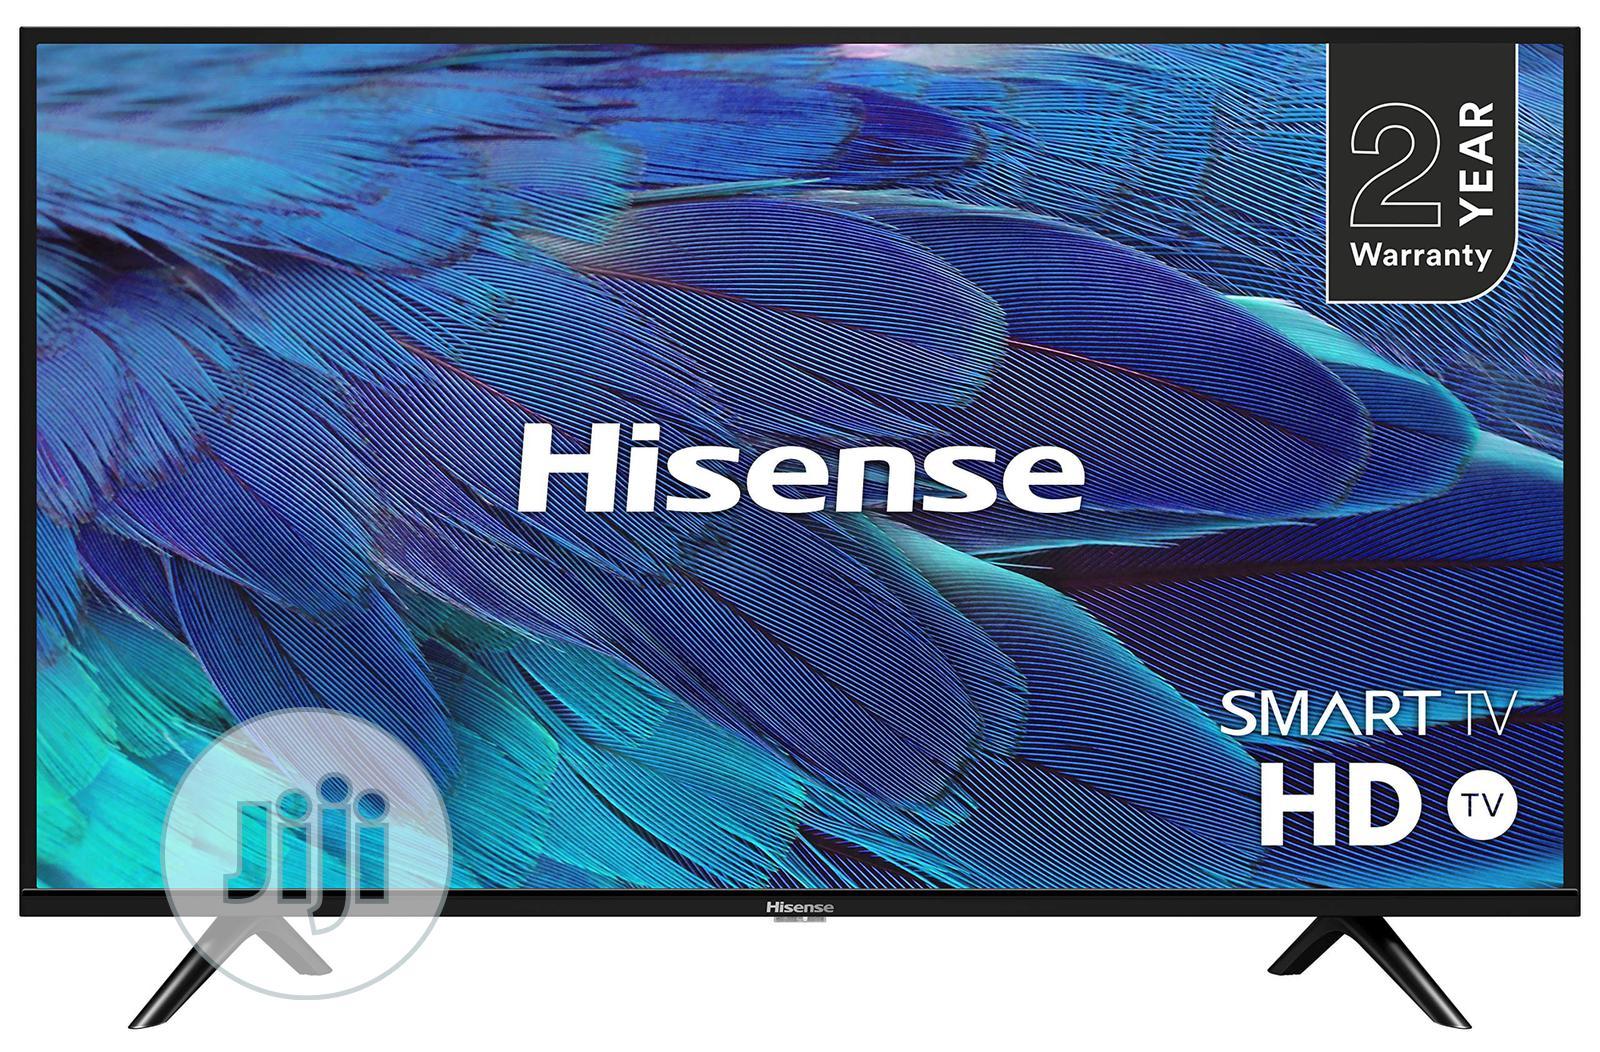 Hisense 32 Inches A5100 LED HD TV Ap14